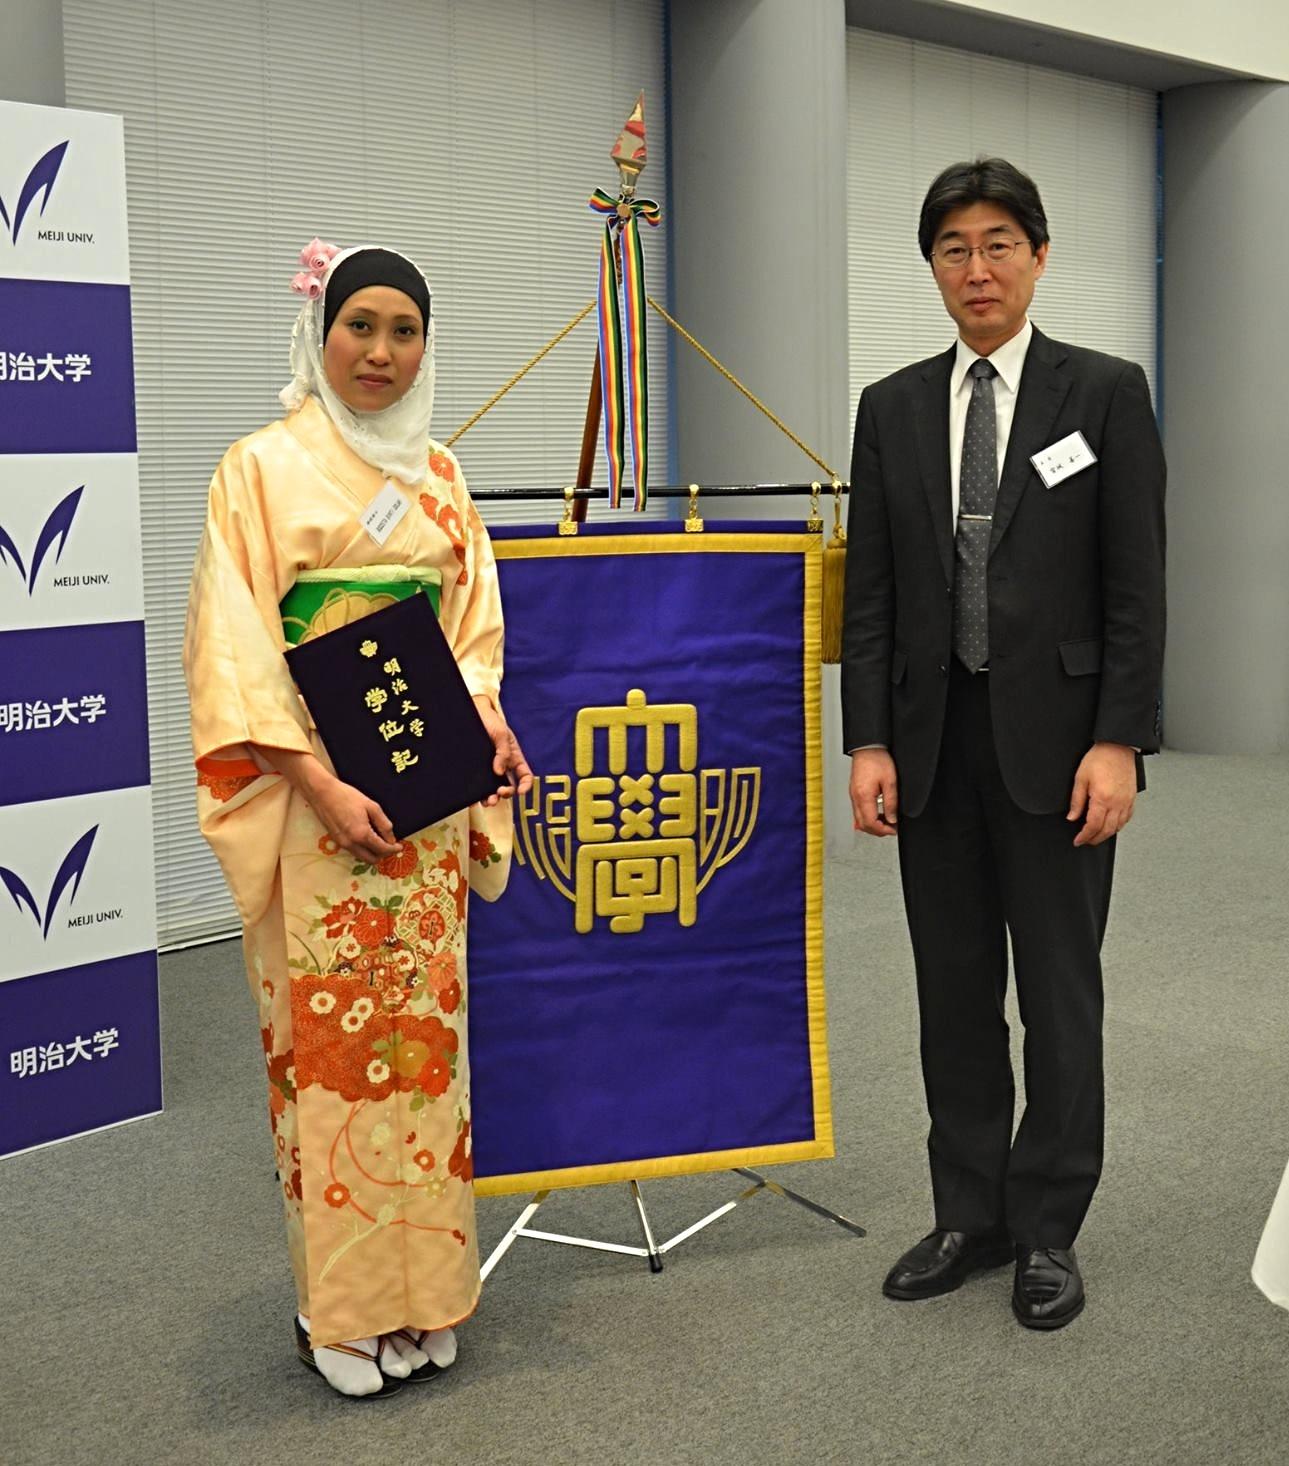 Ph.D Graduation day at Meiji University with Supervisor_Prof. Dr. Zenichi Miyagi